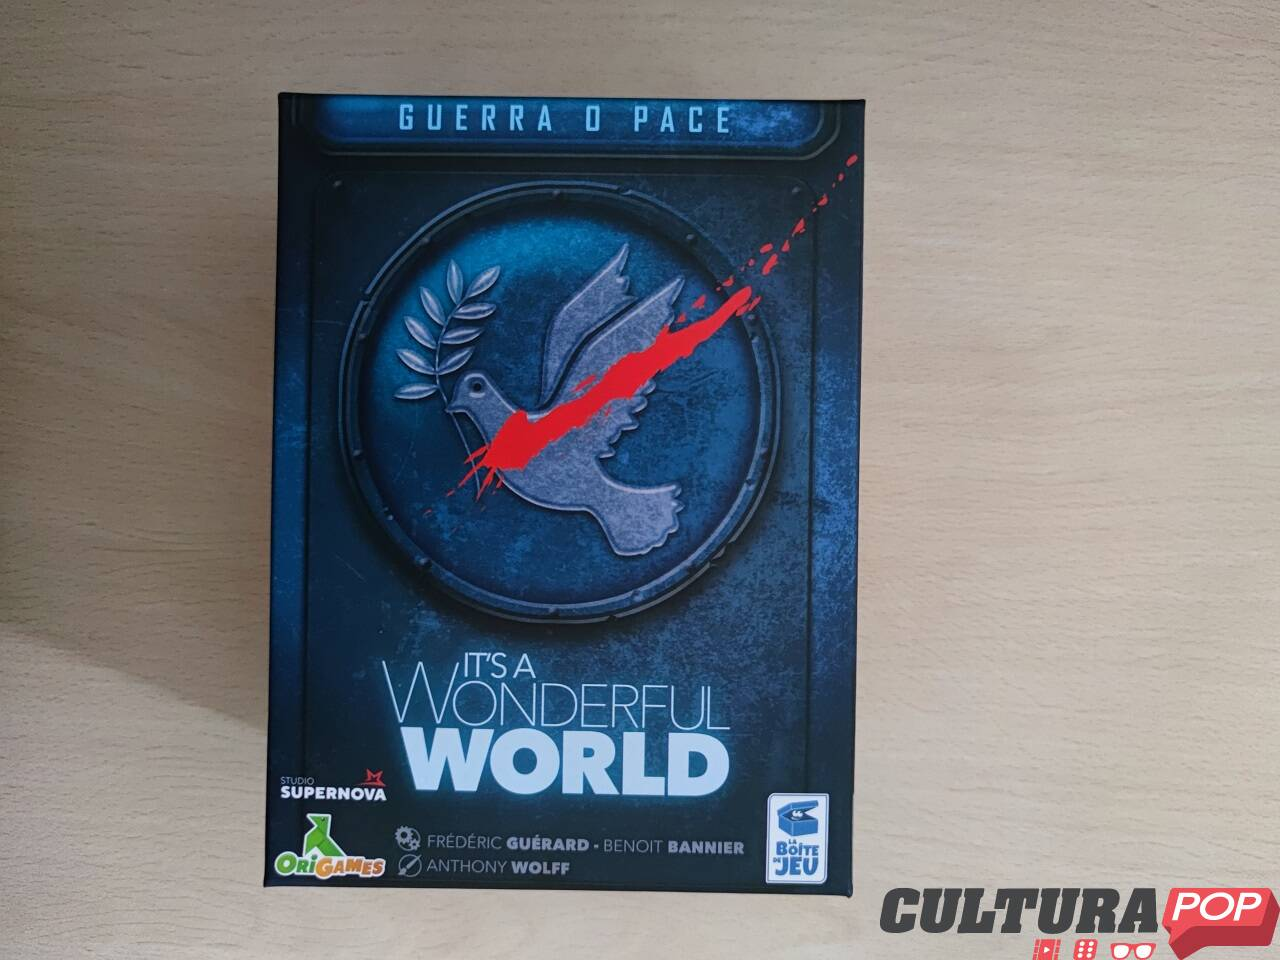 It's a Wonderful World: Guerra o Pace